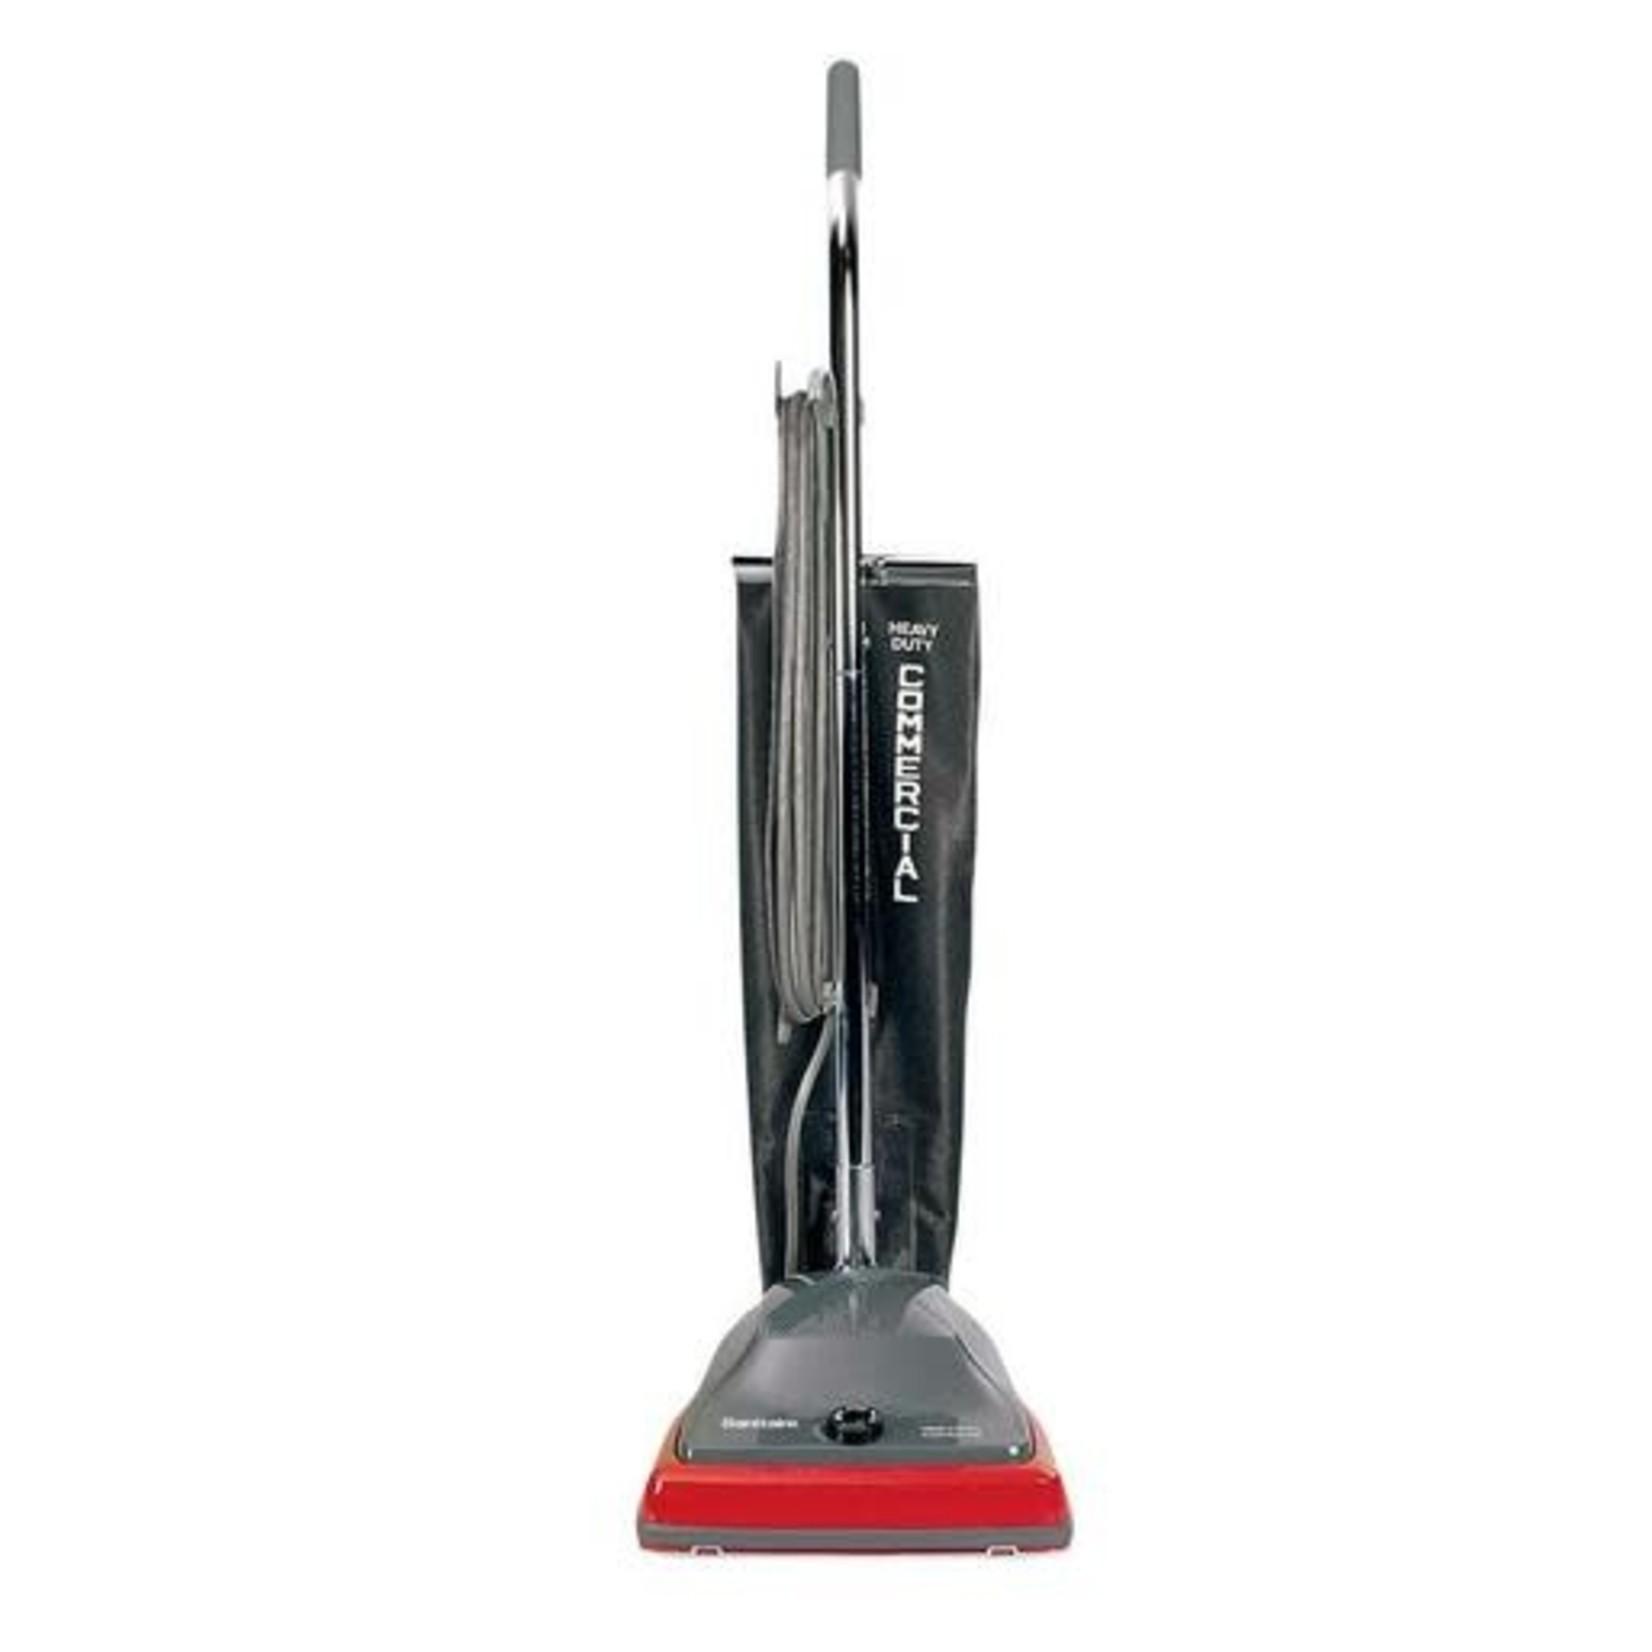 Sanitaire SC679 TRADITION™ Upright Vacuum